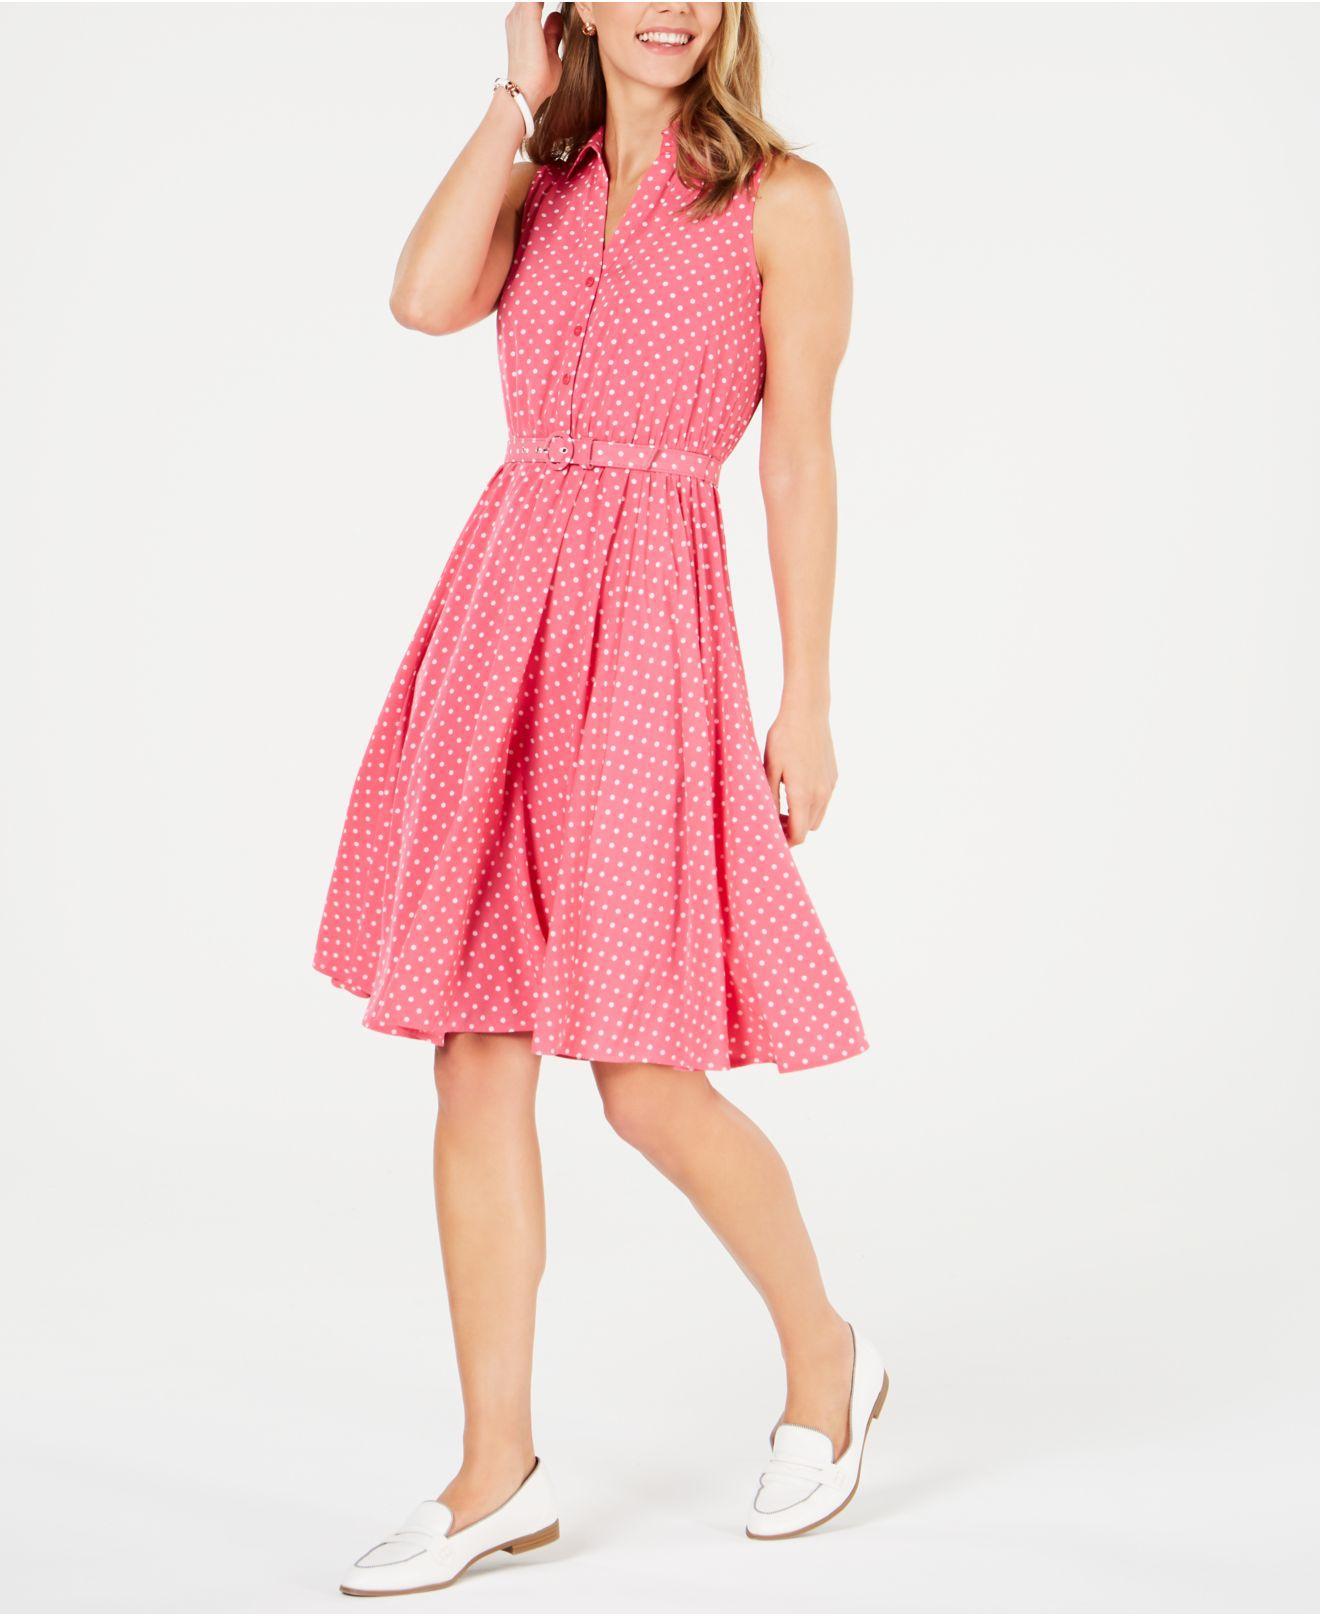 b2ce700bc6 Lyst - Charter Club Petite Belted Polka-dot Dress